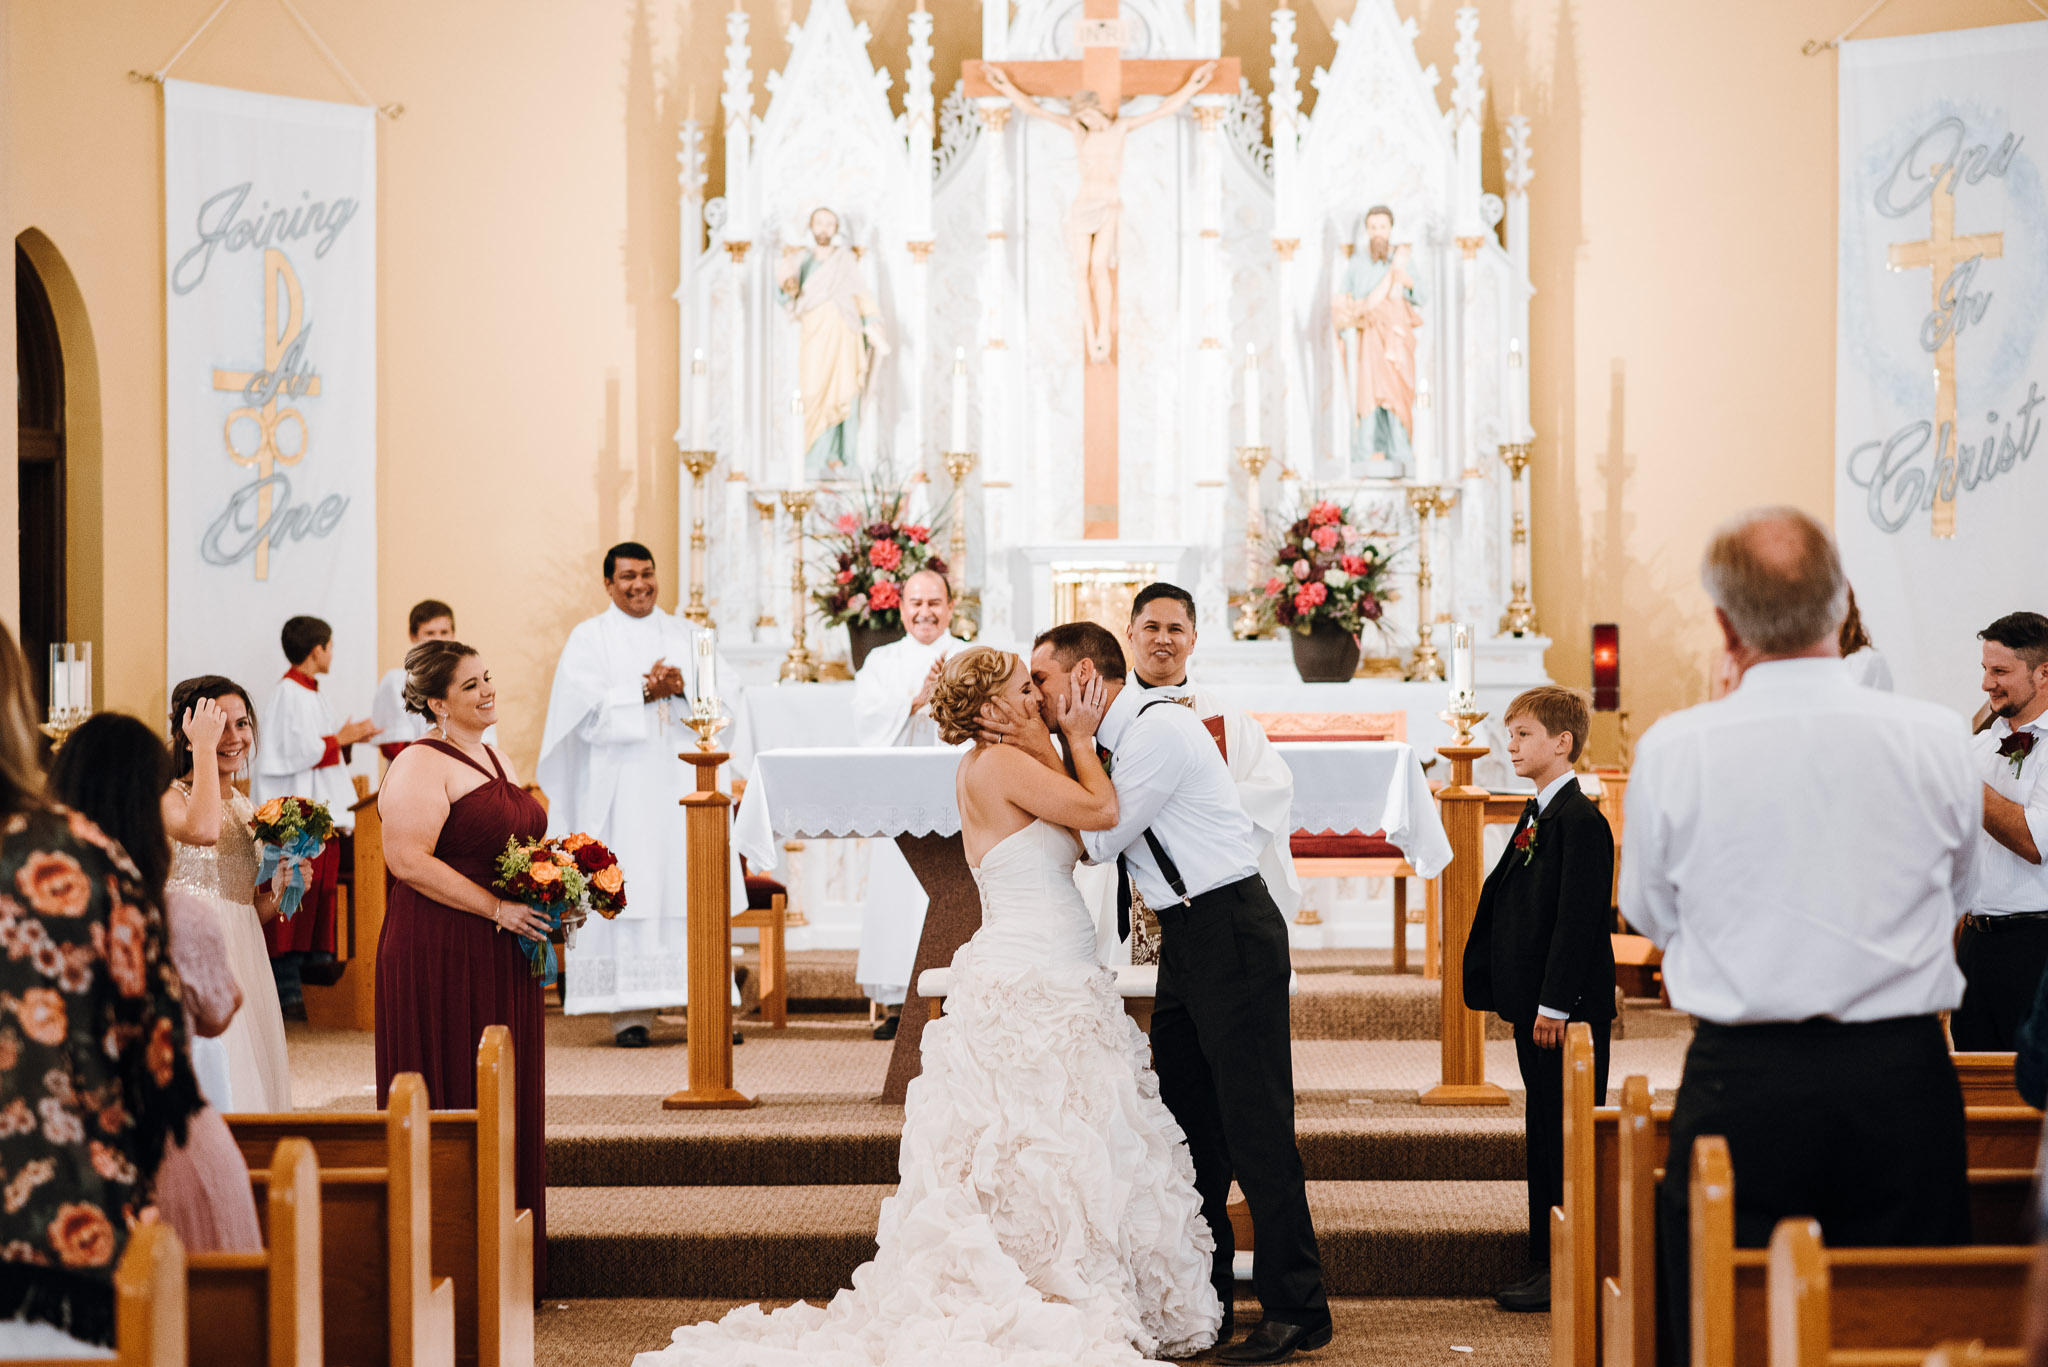 Rowena-West-Texas-Wedding-Photographer-Gillian&Ryan-0024.jpg